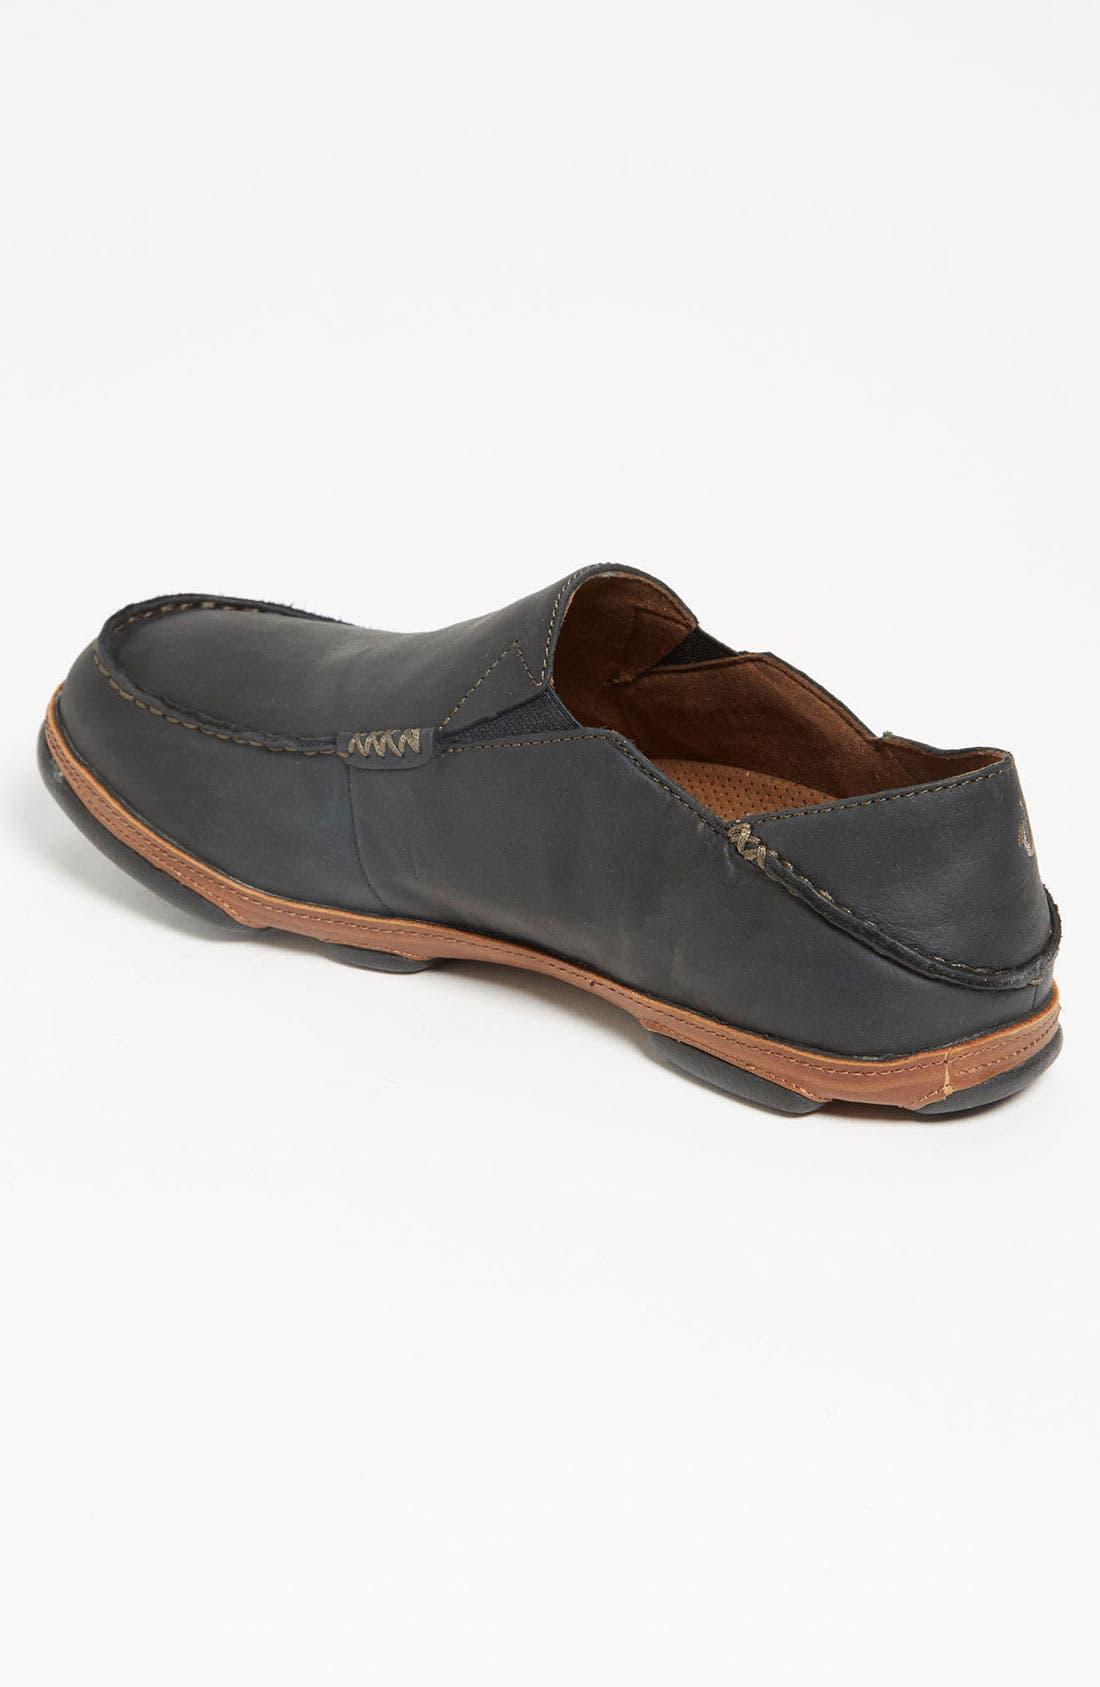 'Moloa' Slip-On,                             Alternate thumbnail 2, color,                             Black/ Toffee Leather